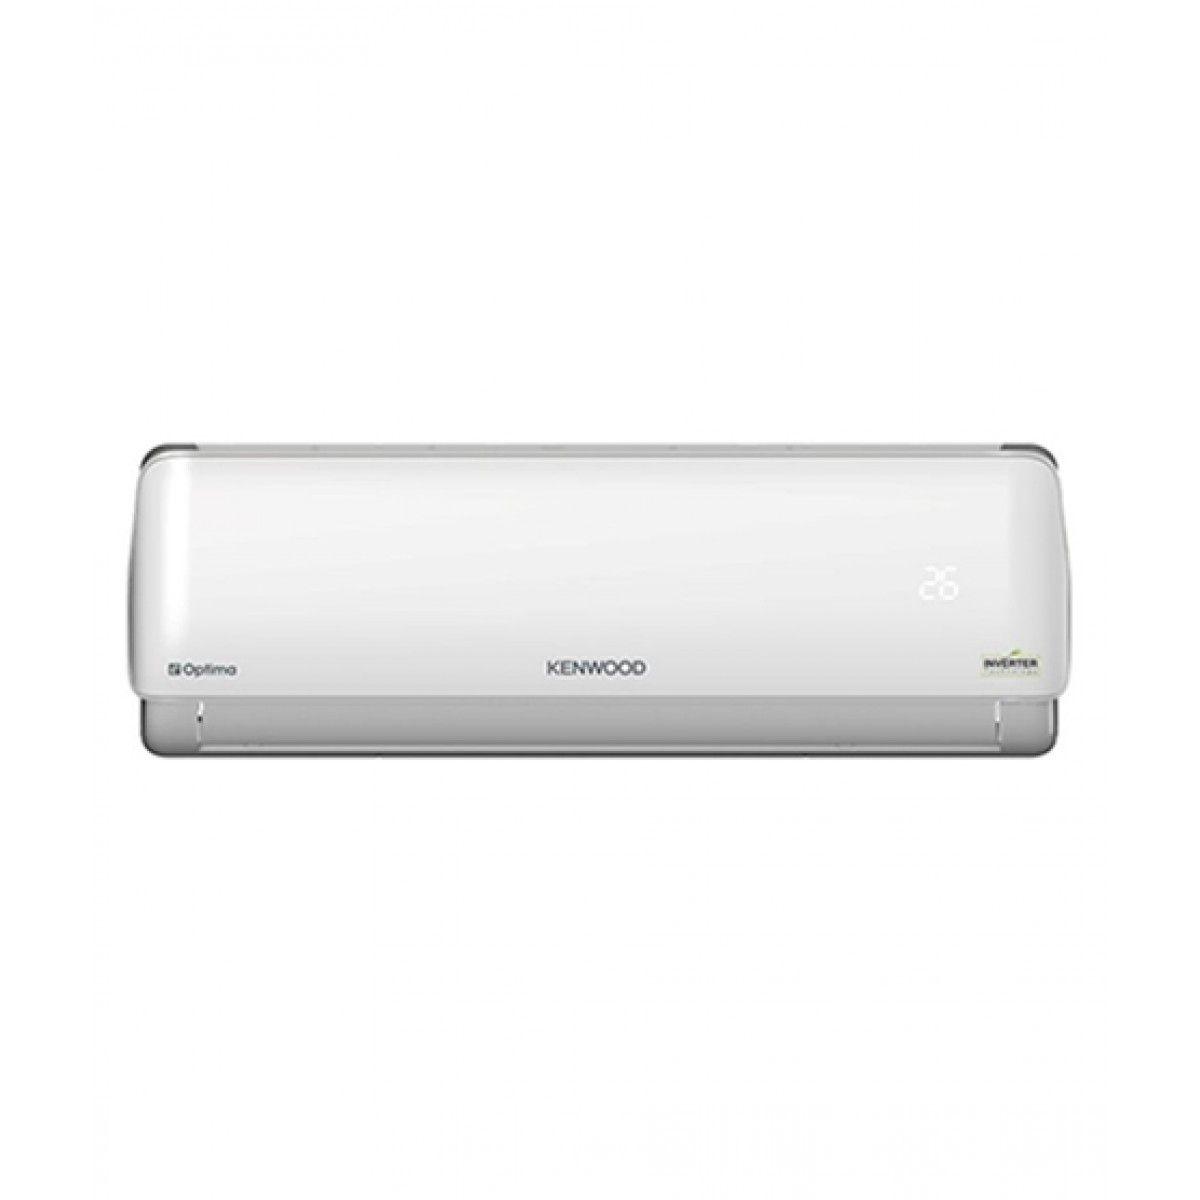 Kenwood E-Optima Inverter AC (KEO-1831S) 1.5 Ton